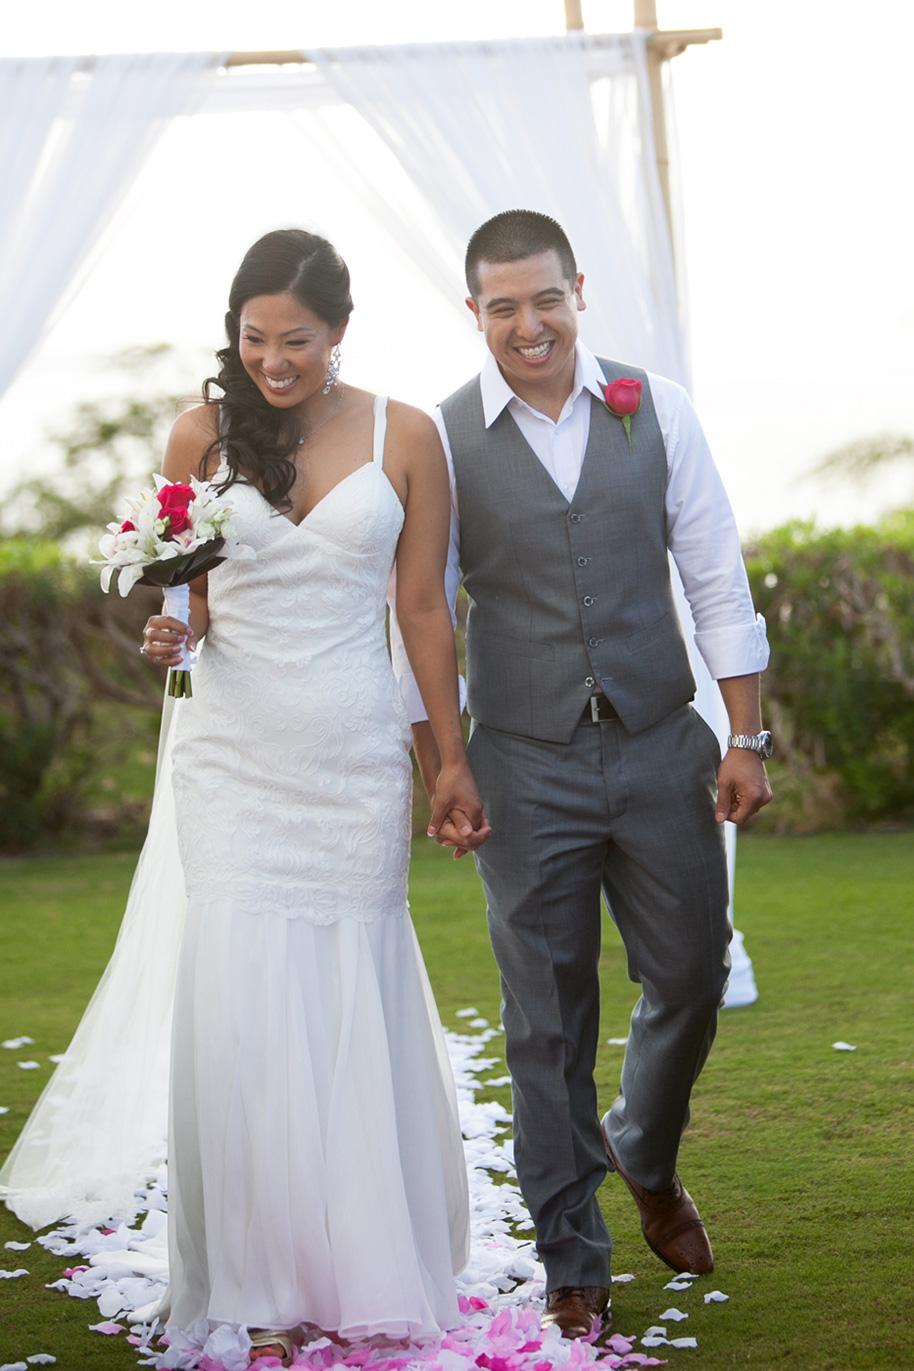 Maui-Beach-Wedding-041216-12